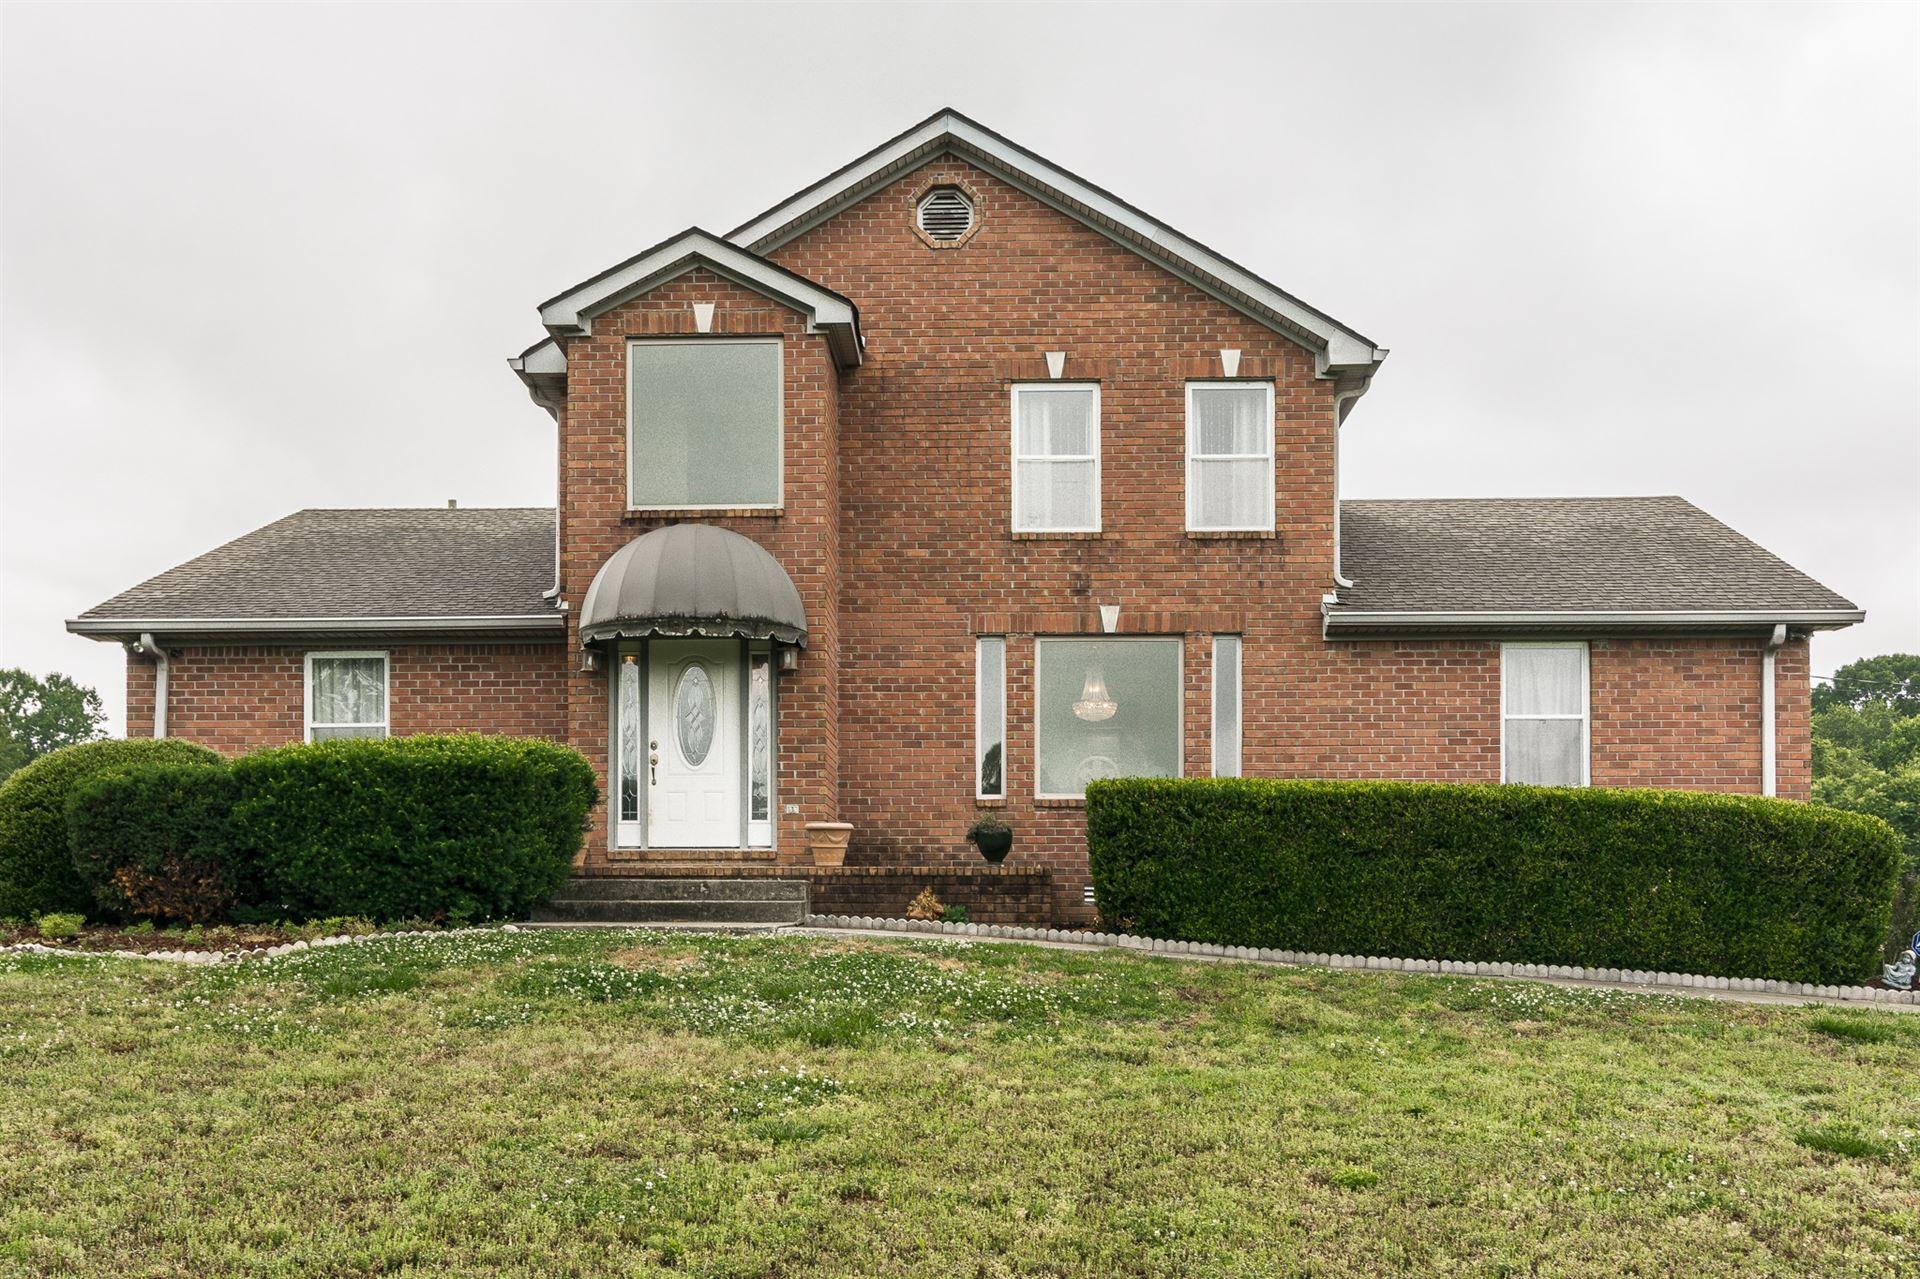 1951 South Walker Road, Pleasant View, TN 37146 - MLS#: 2258366